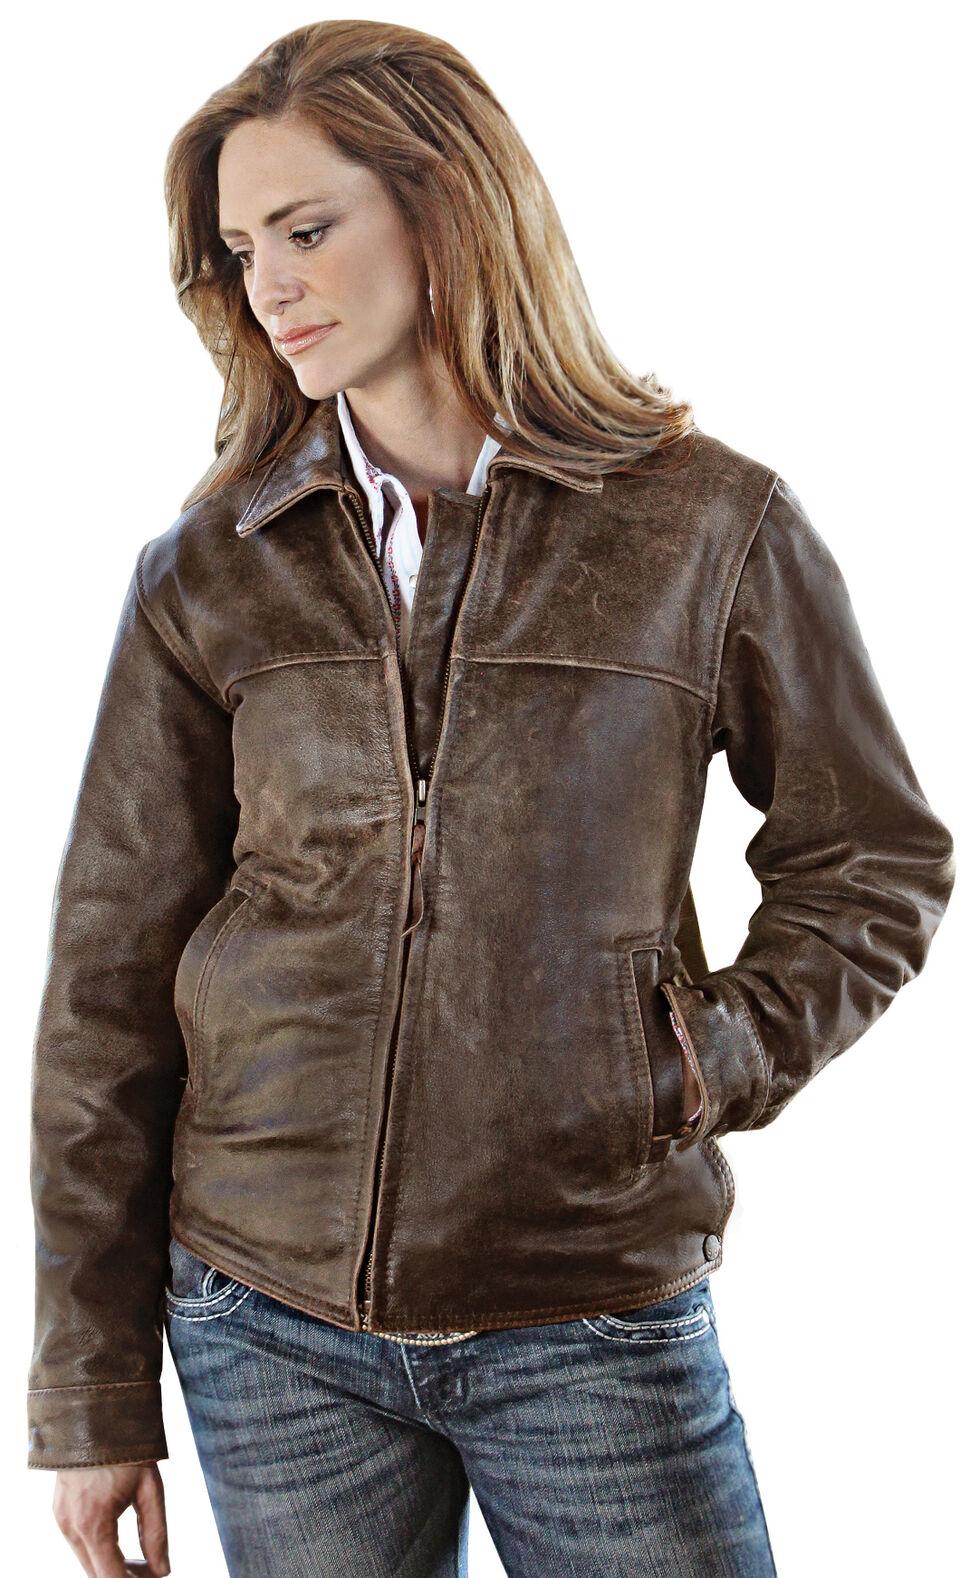 STS Ranchwear Women's Rifleman Brown Leather Jacket - Plus - 2XL, Brown, hi-res